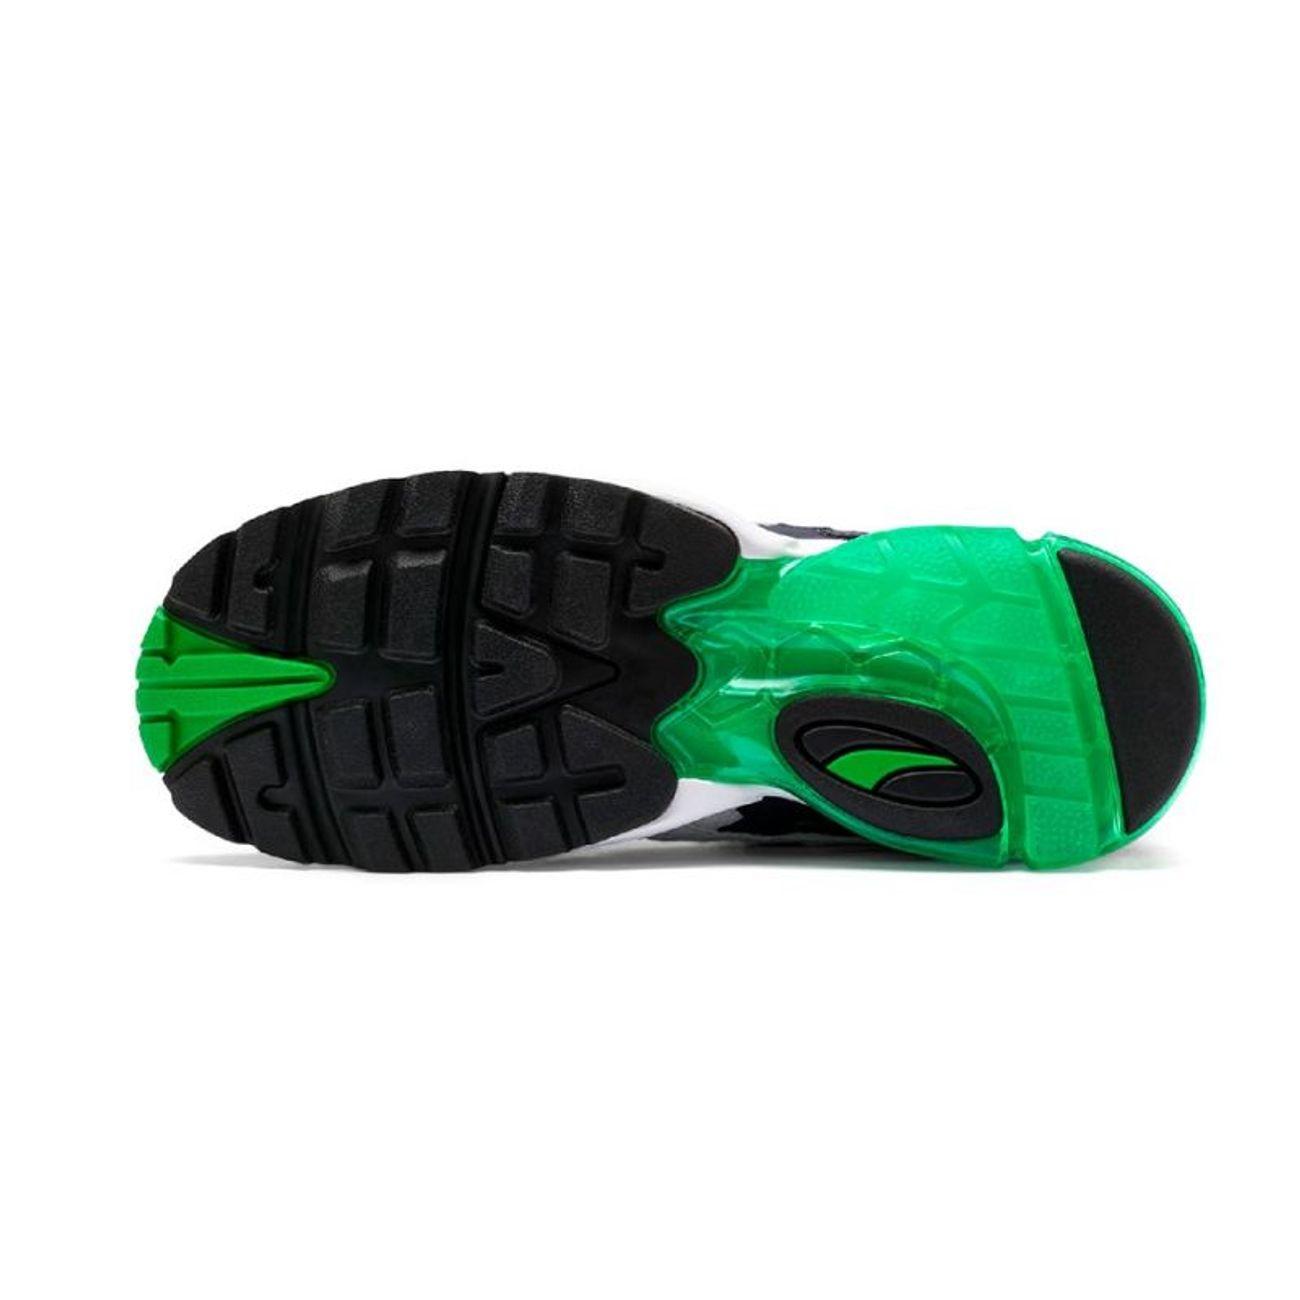 Puma 02 Alien Cell Adulte Noir Vert Padel Og 369801 QdhrtCs